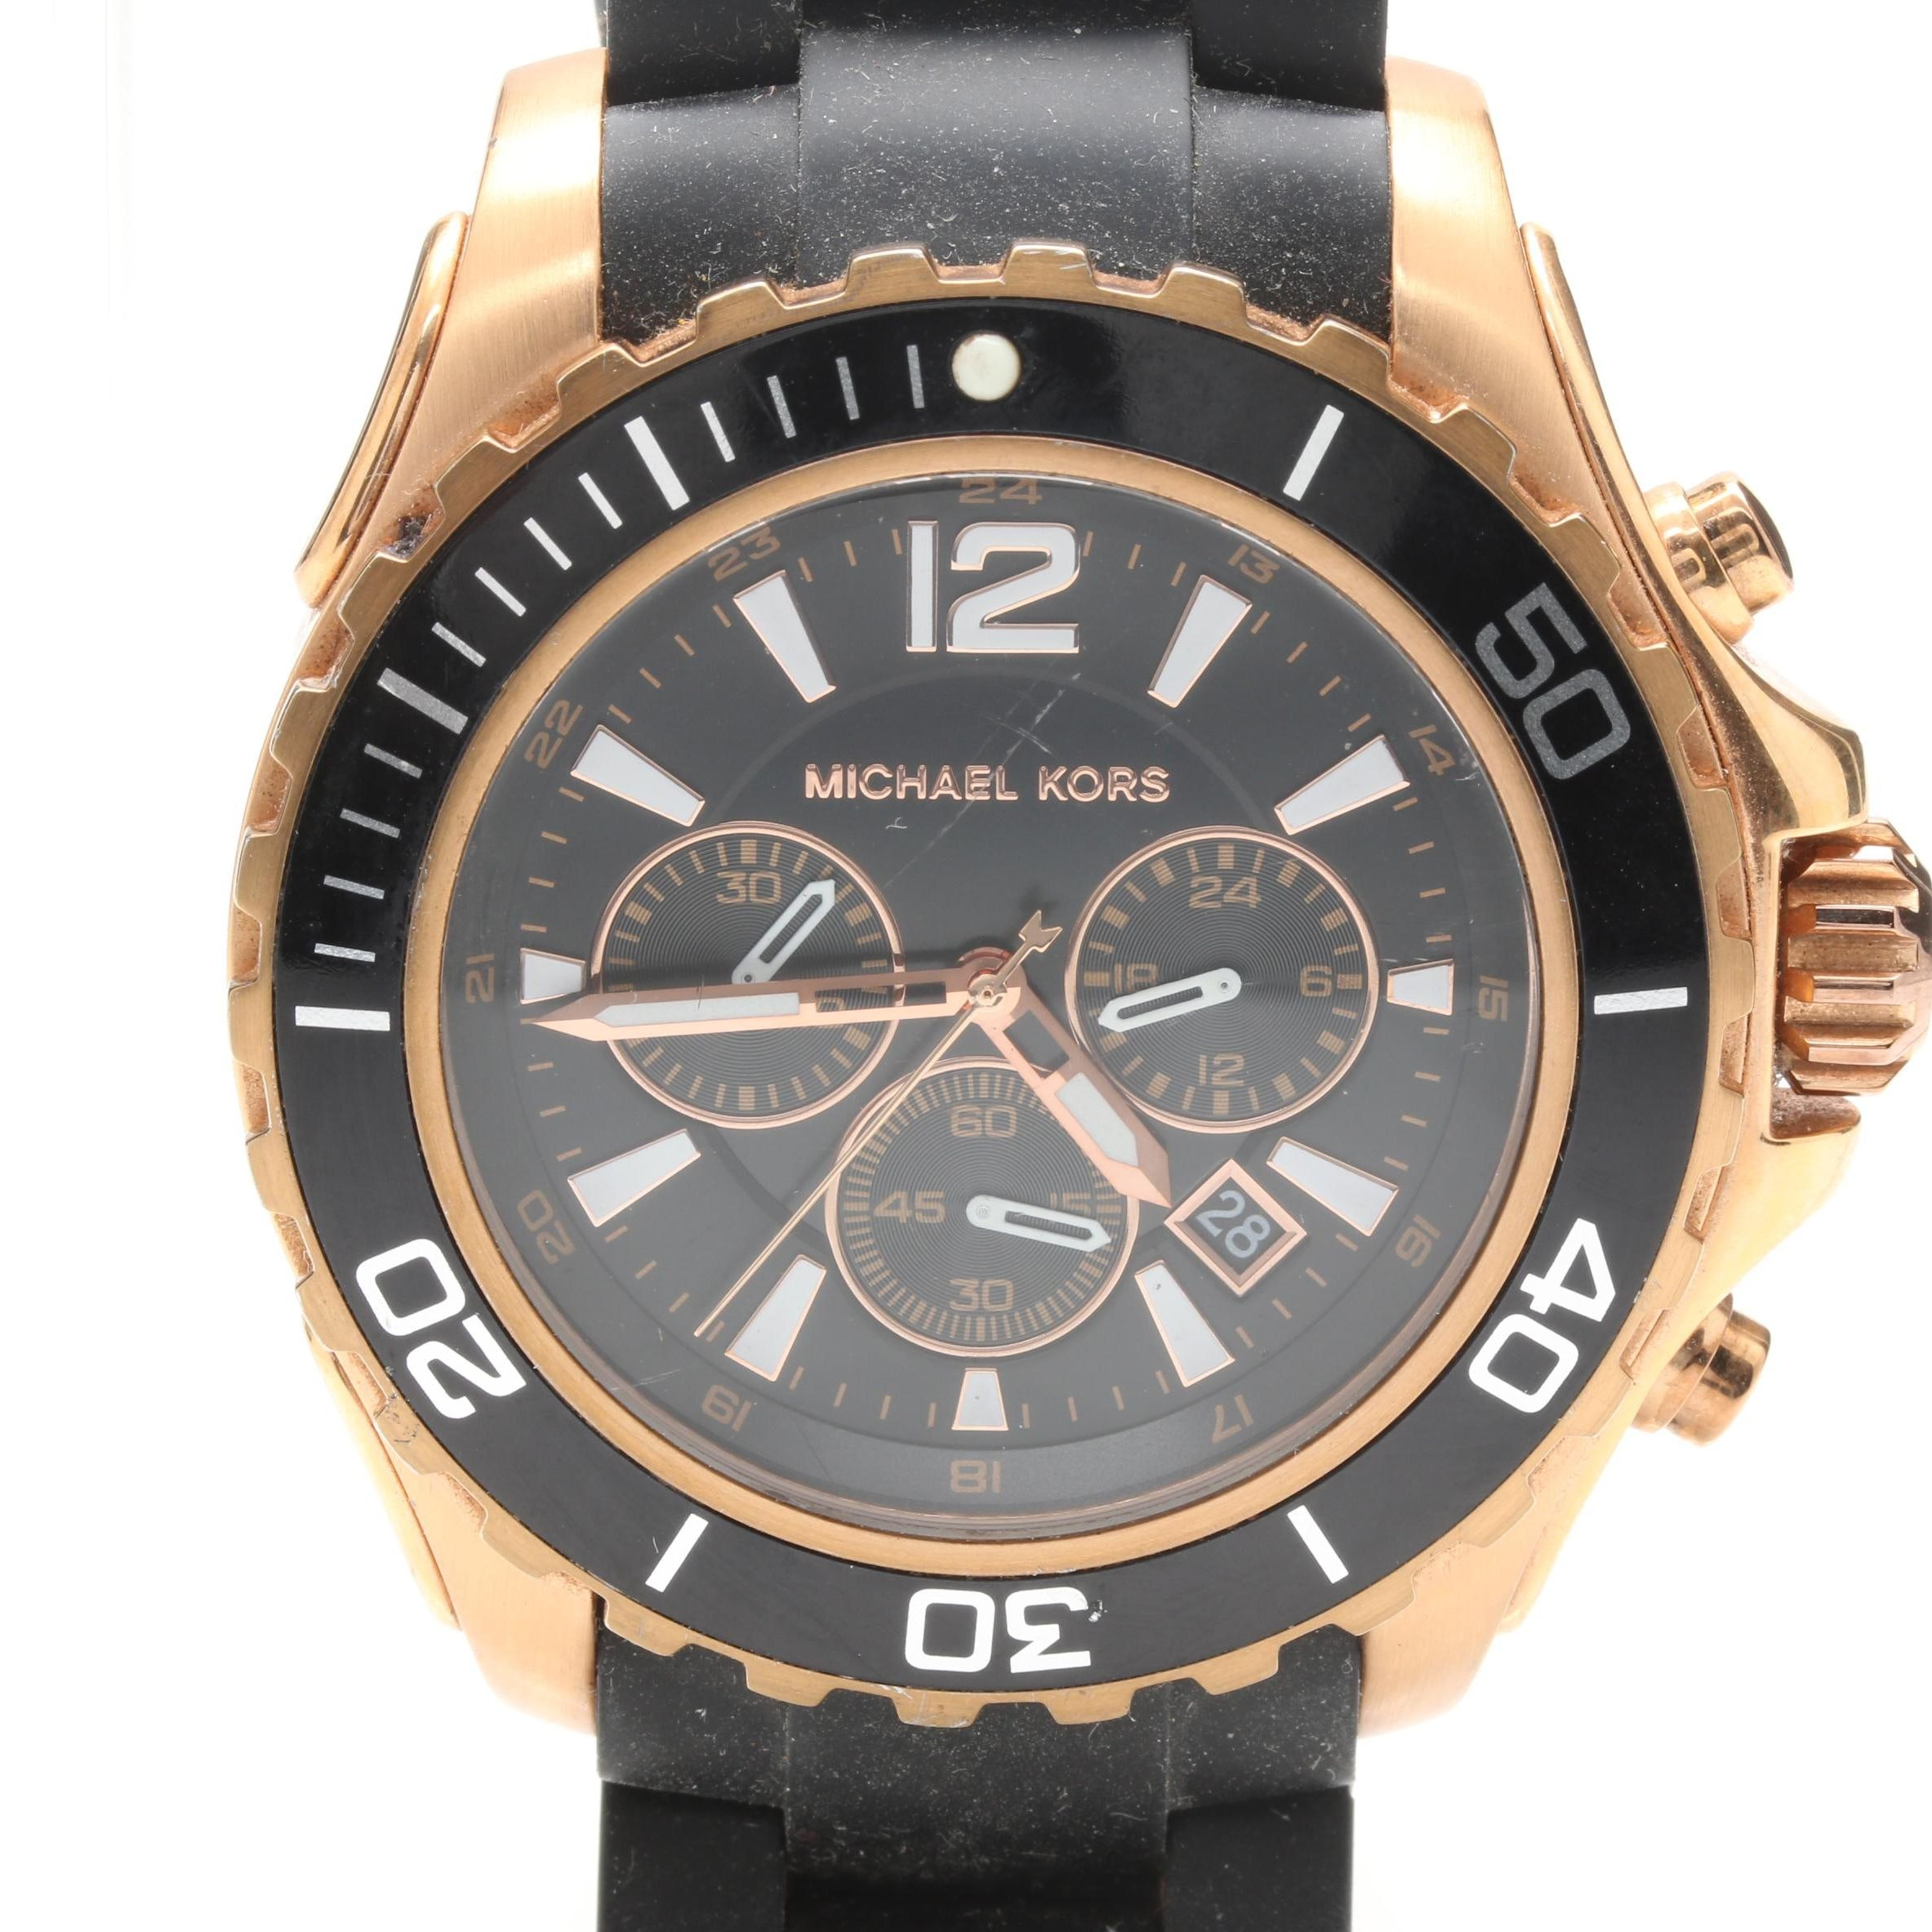 Michael Kors Gold Tone Chronograph Wristwatch